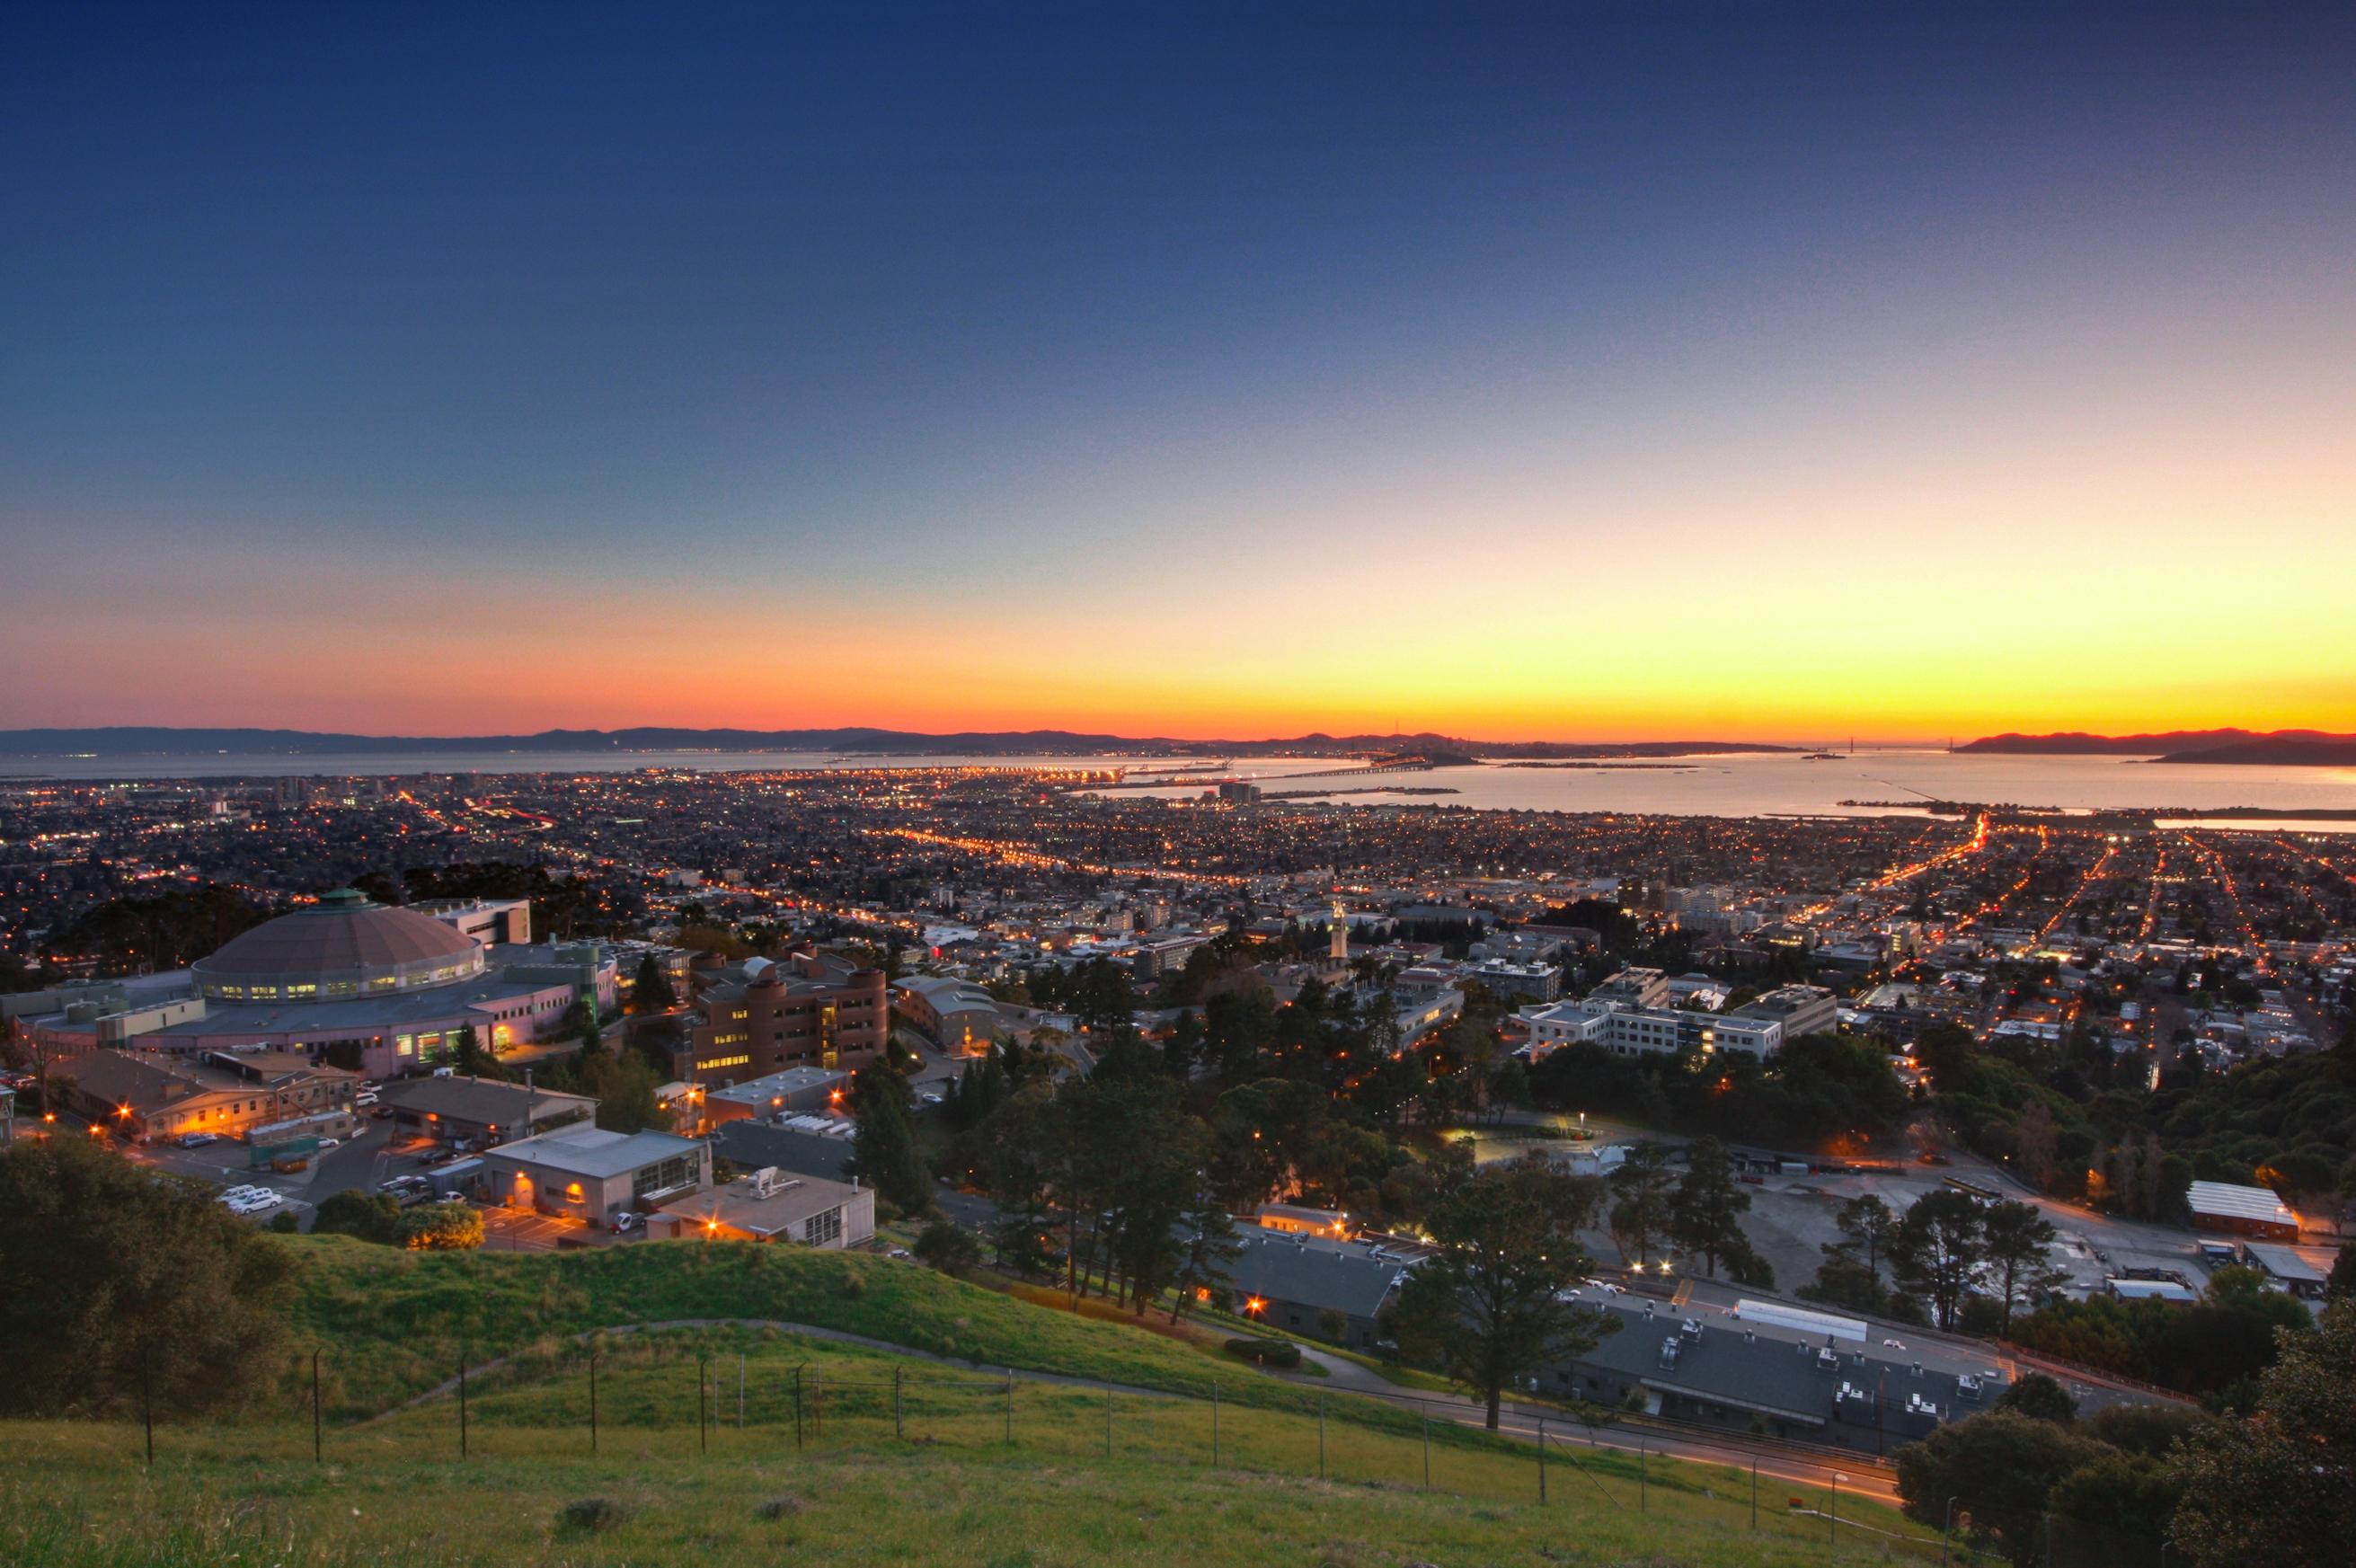 Dusk in the Berkeley Hills   Flickr - Photo Sharing!